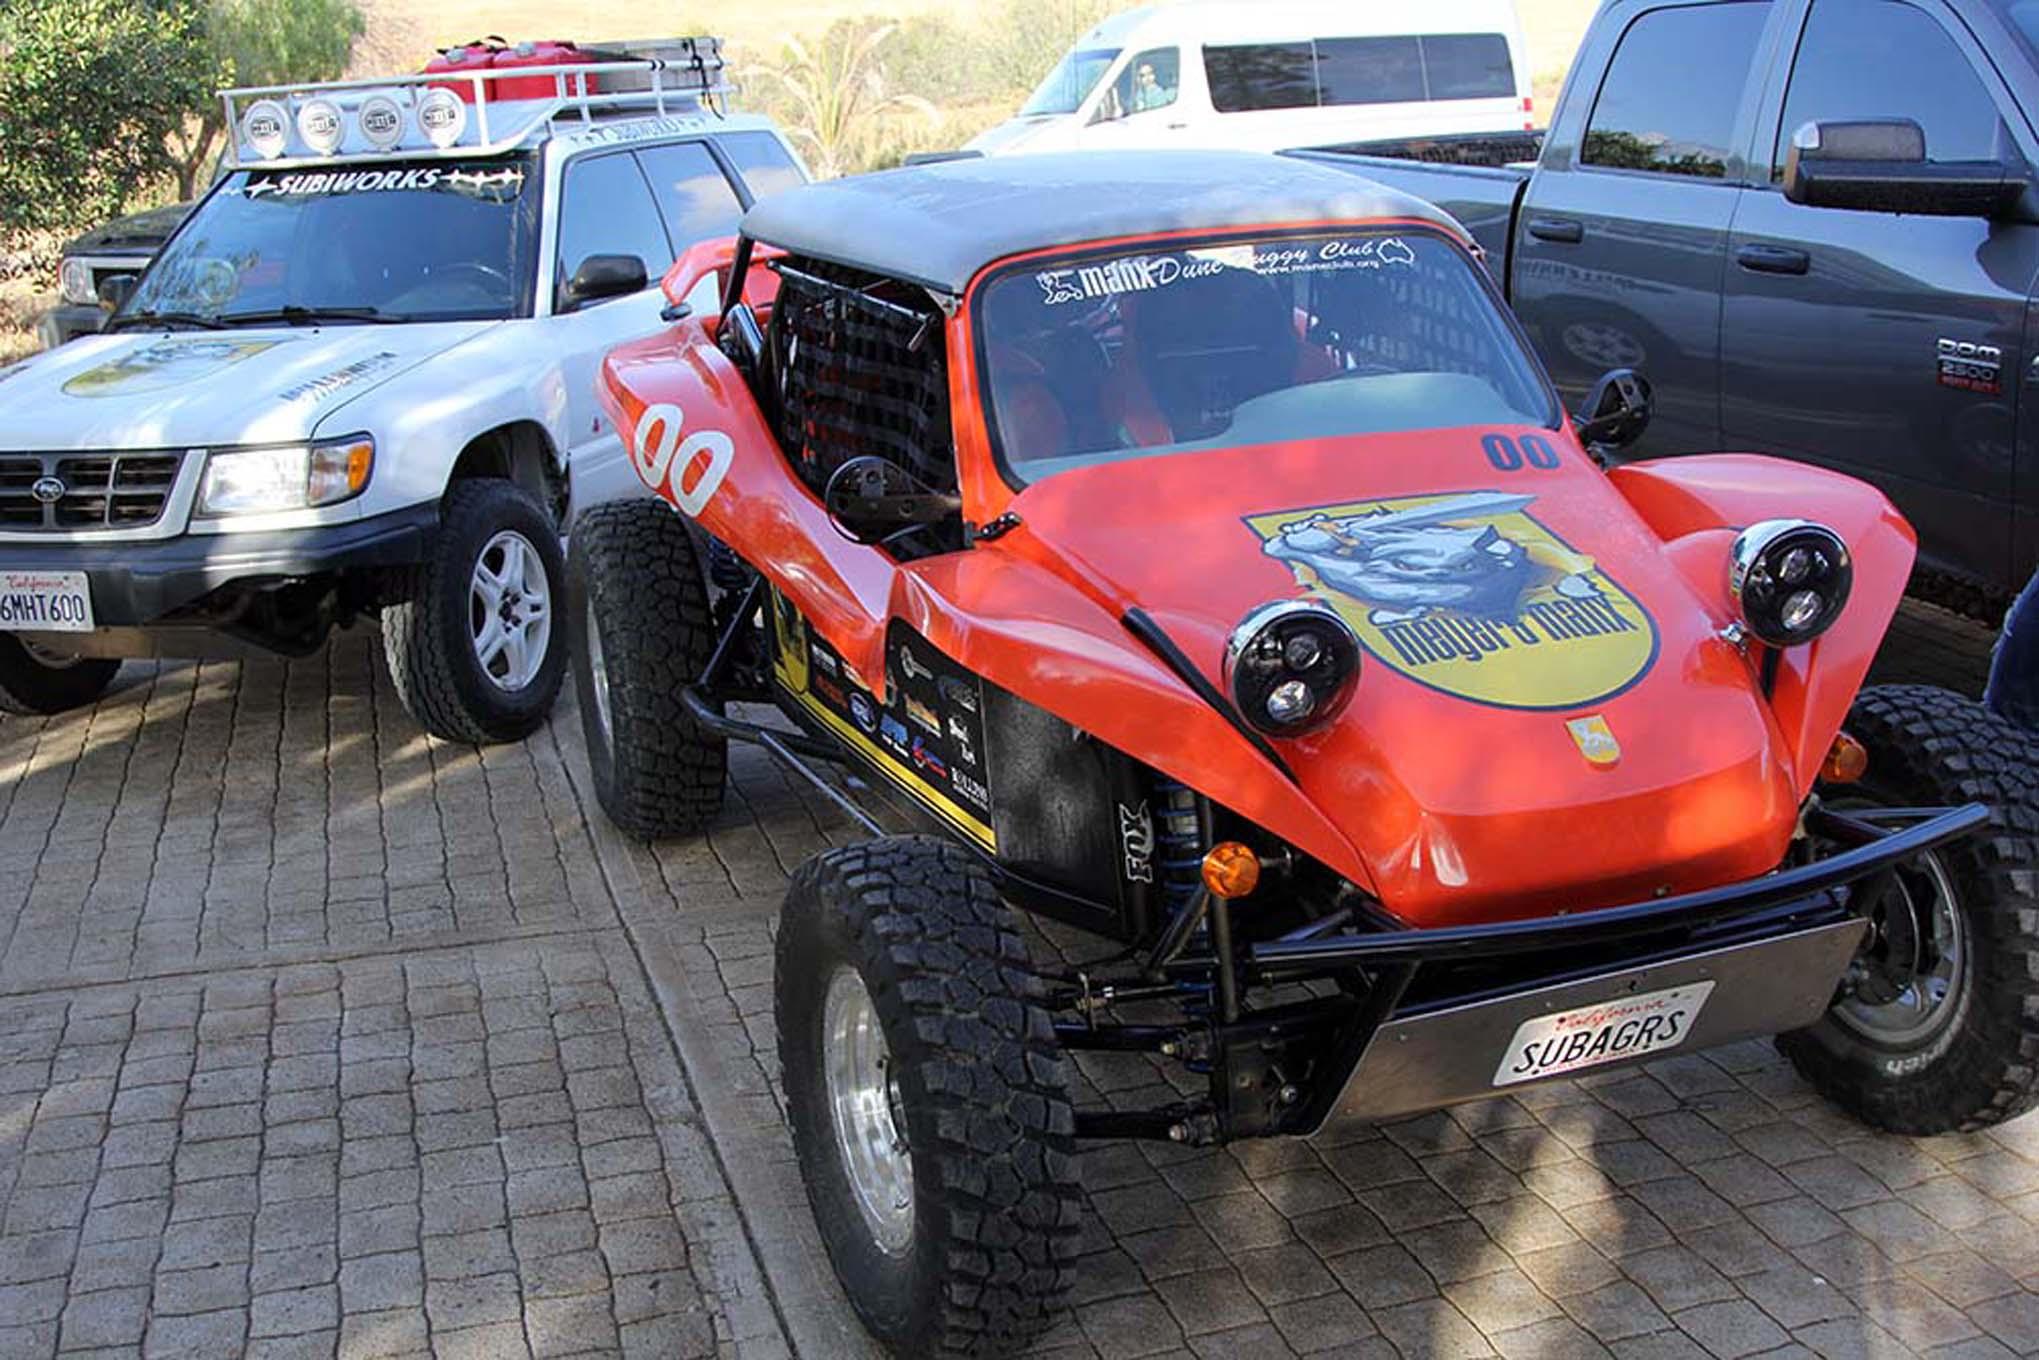 075NORRA Mexican 1000 BAJA offroad Race 2015 Manx Nova Chevy James Garner